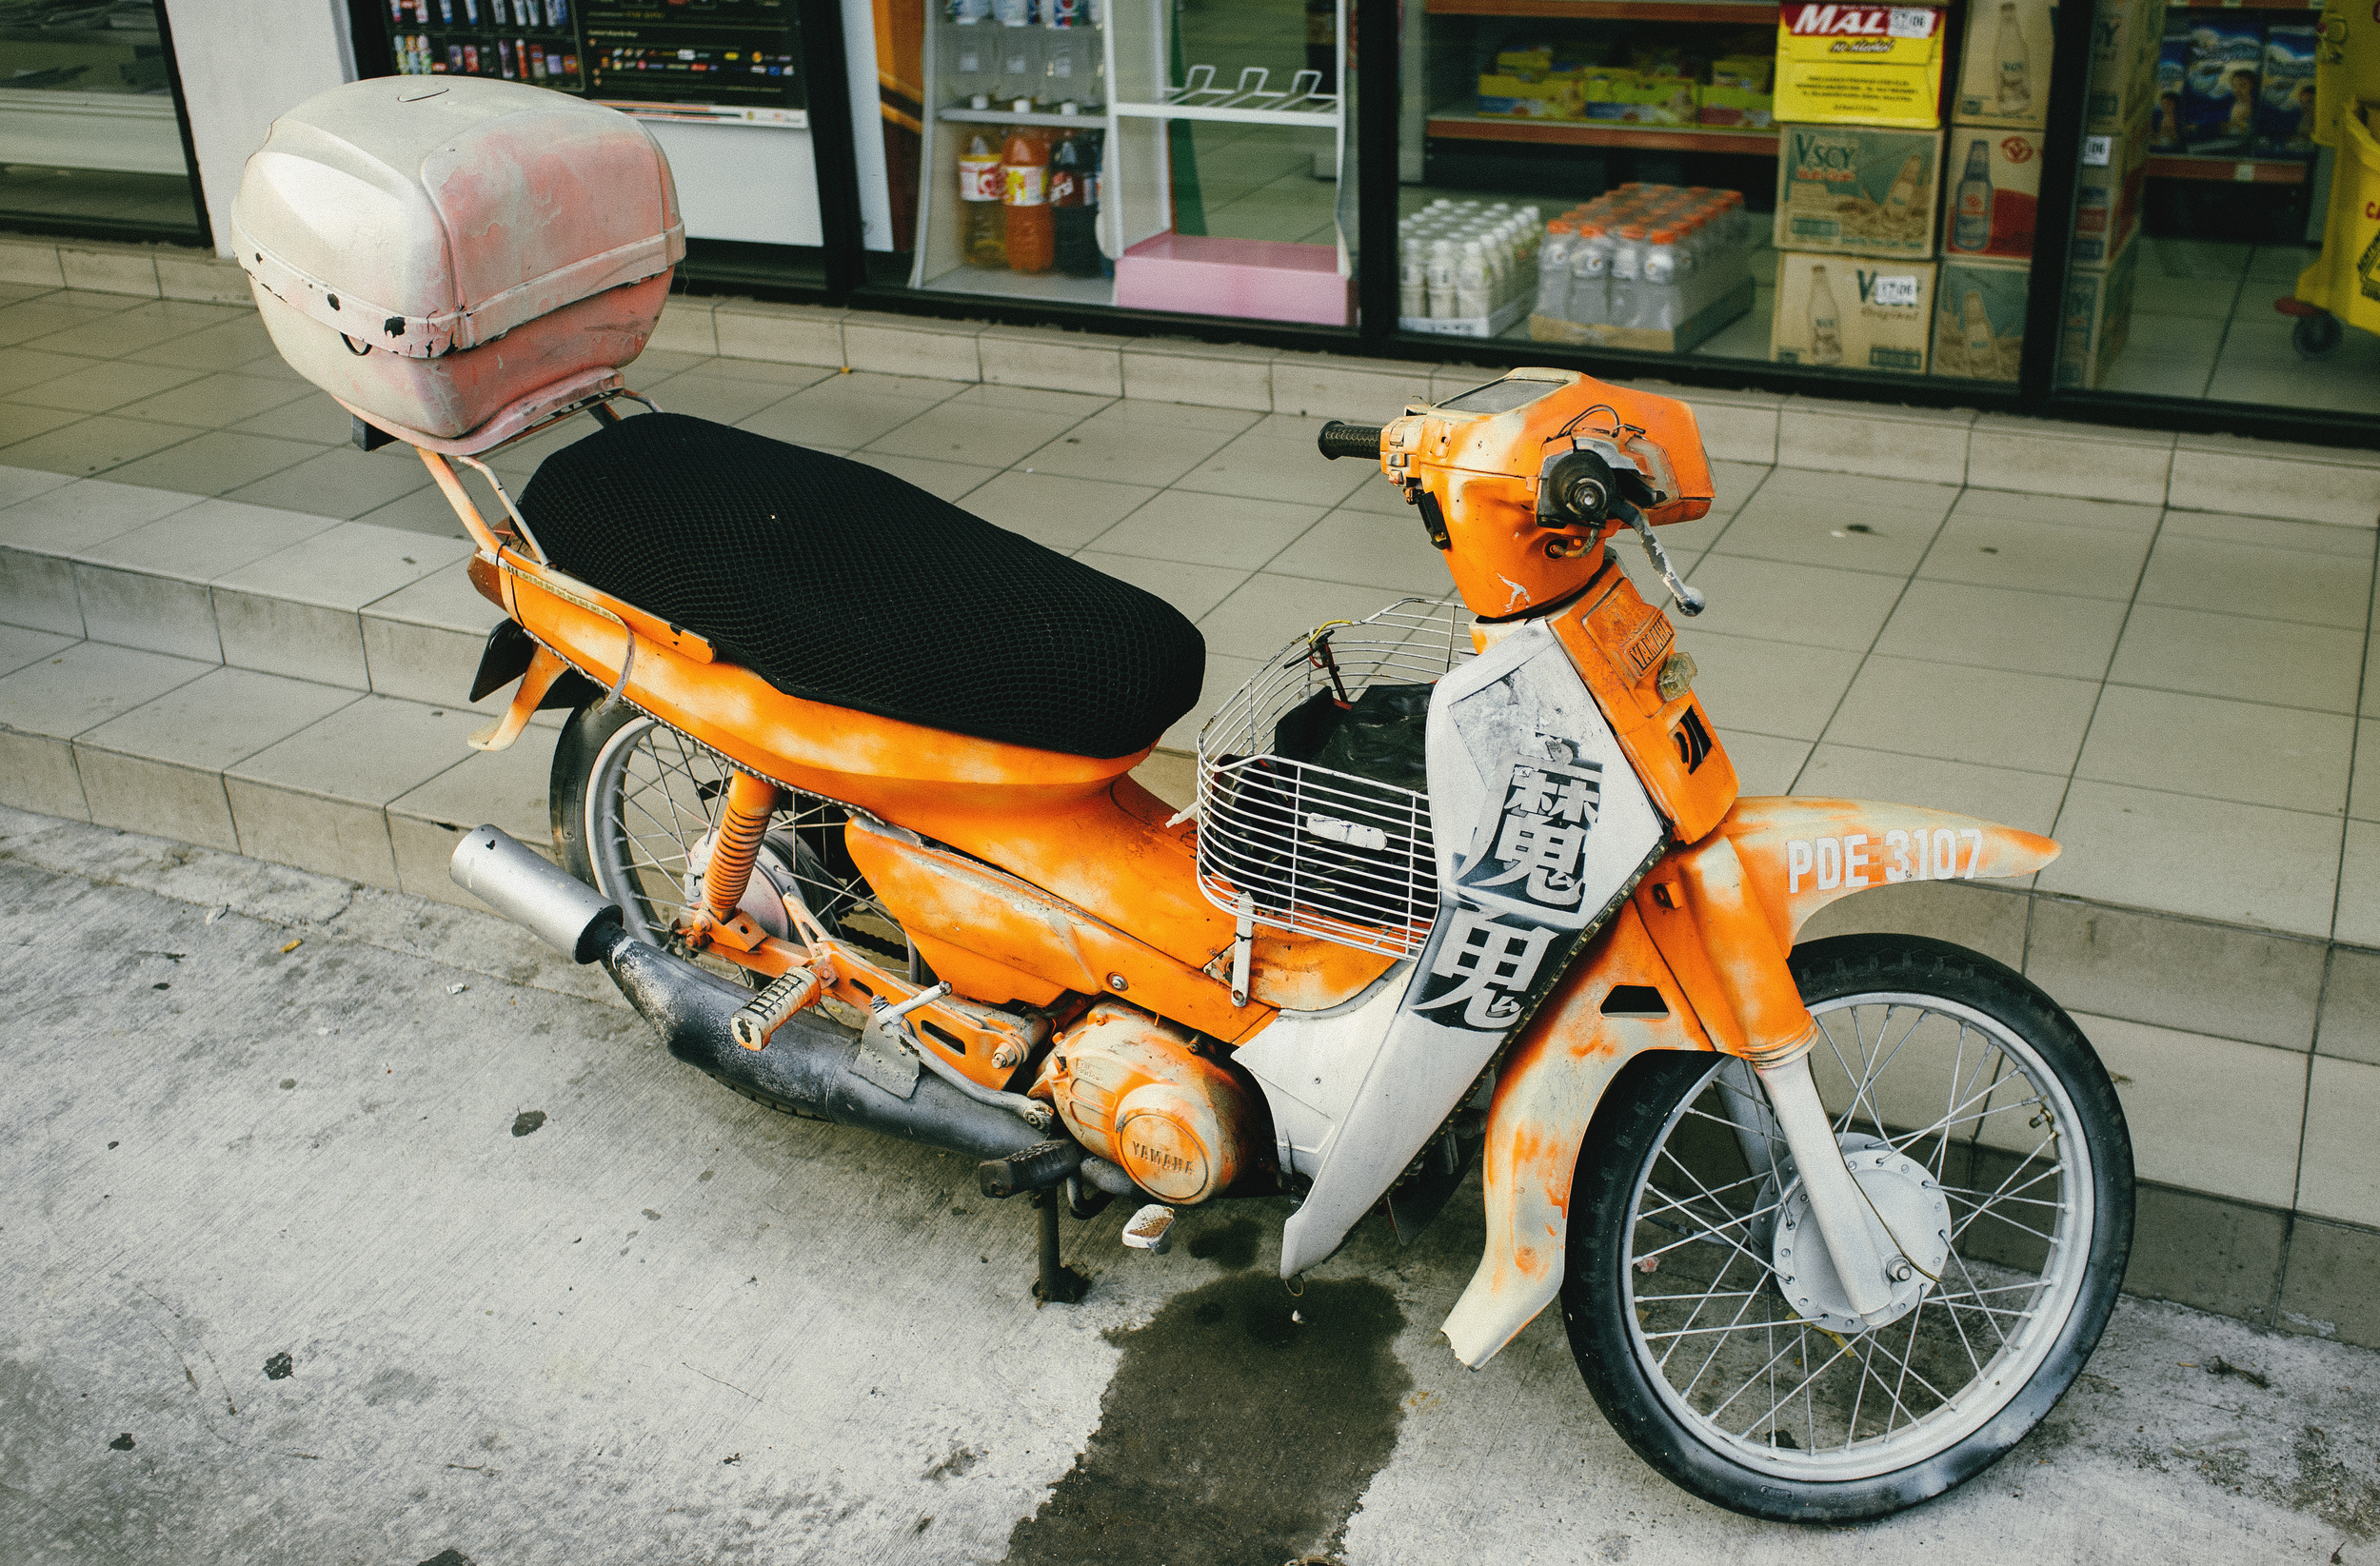 Kuala Lumpur Motorbike.jpg